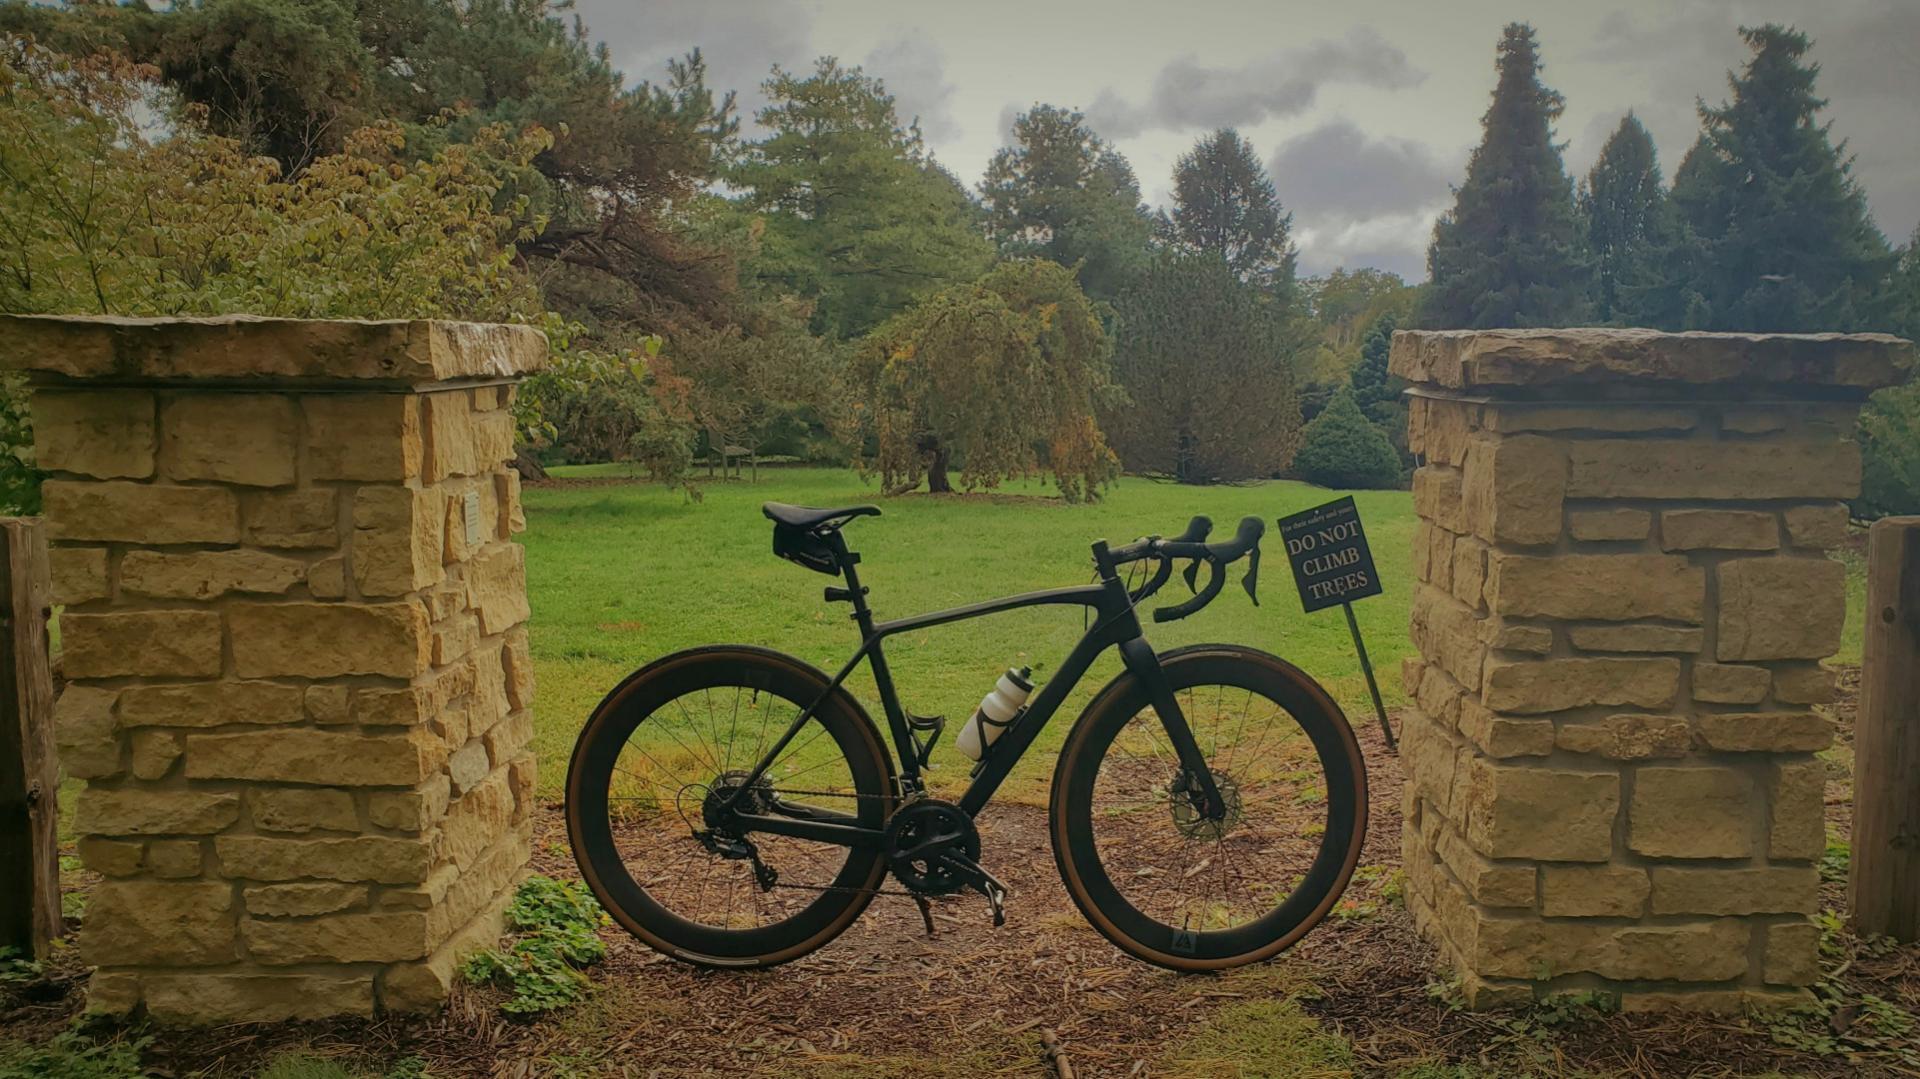 ican-ac388-700c-bike-for-farm-road-trail-riding